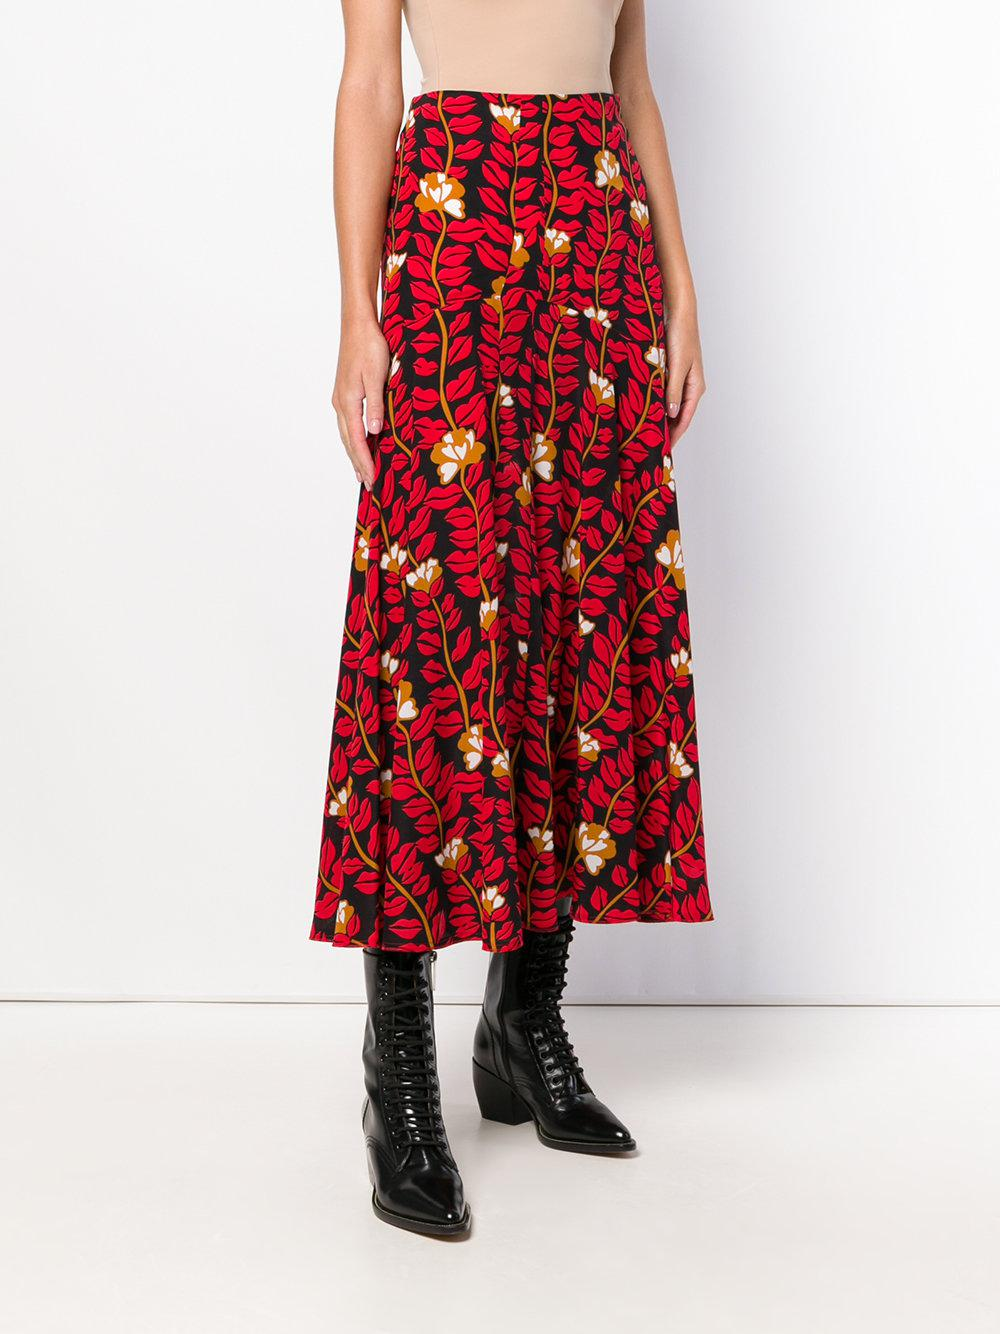 7fc4fd53554420 Lyst - Sonia Rykiel Lonf Printed Skirt in Red